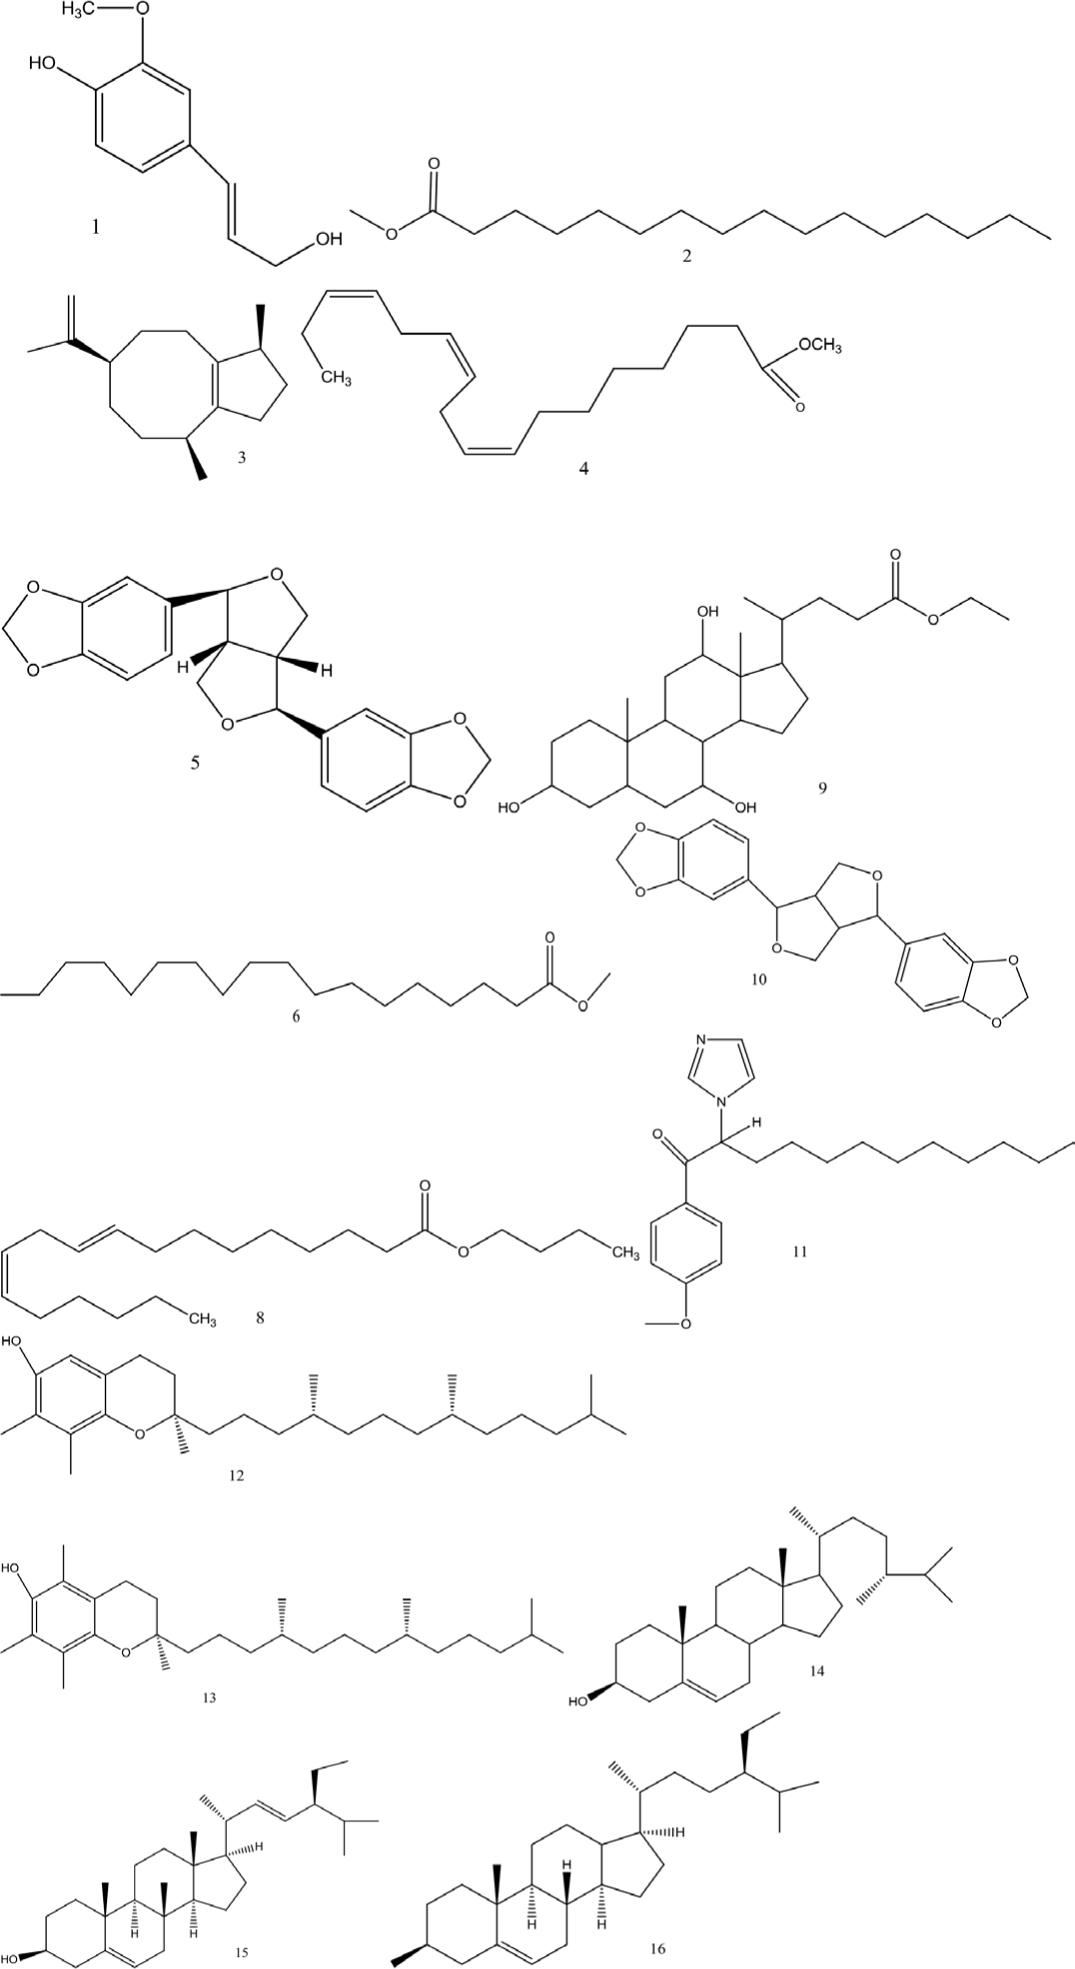 https://s3-us-west-2.amazonaws.com/jourdata/pj/PharmacognJ-10-194-g001.jpg